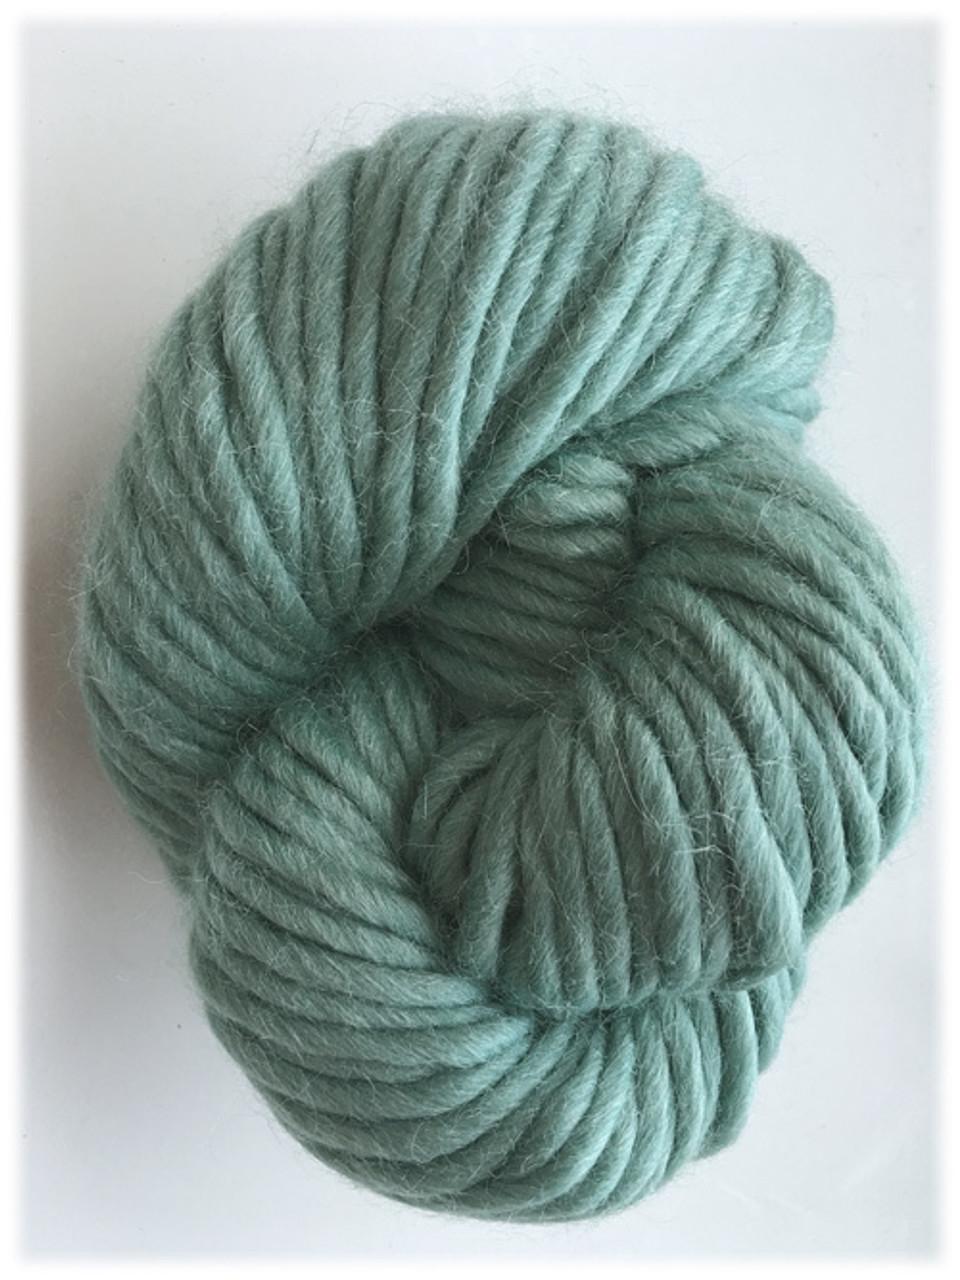 Mirasol Sulka | Wool, Alpaca, Silk